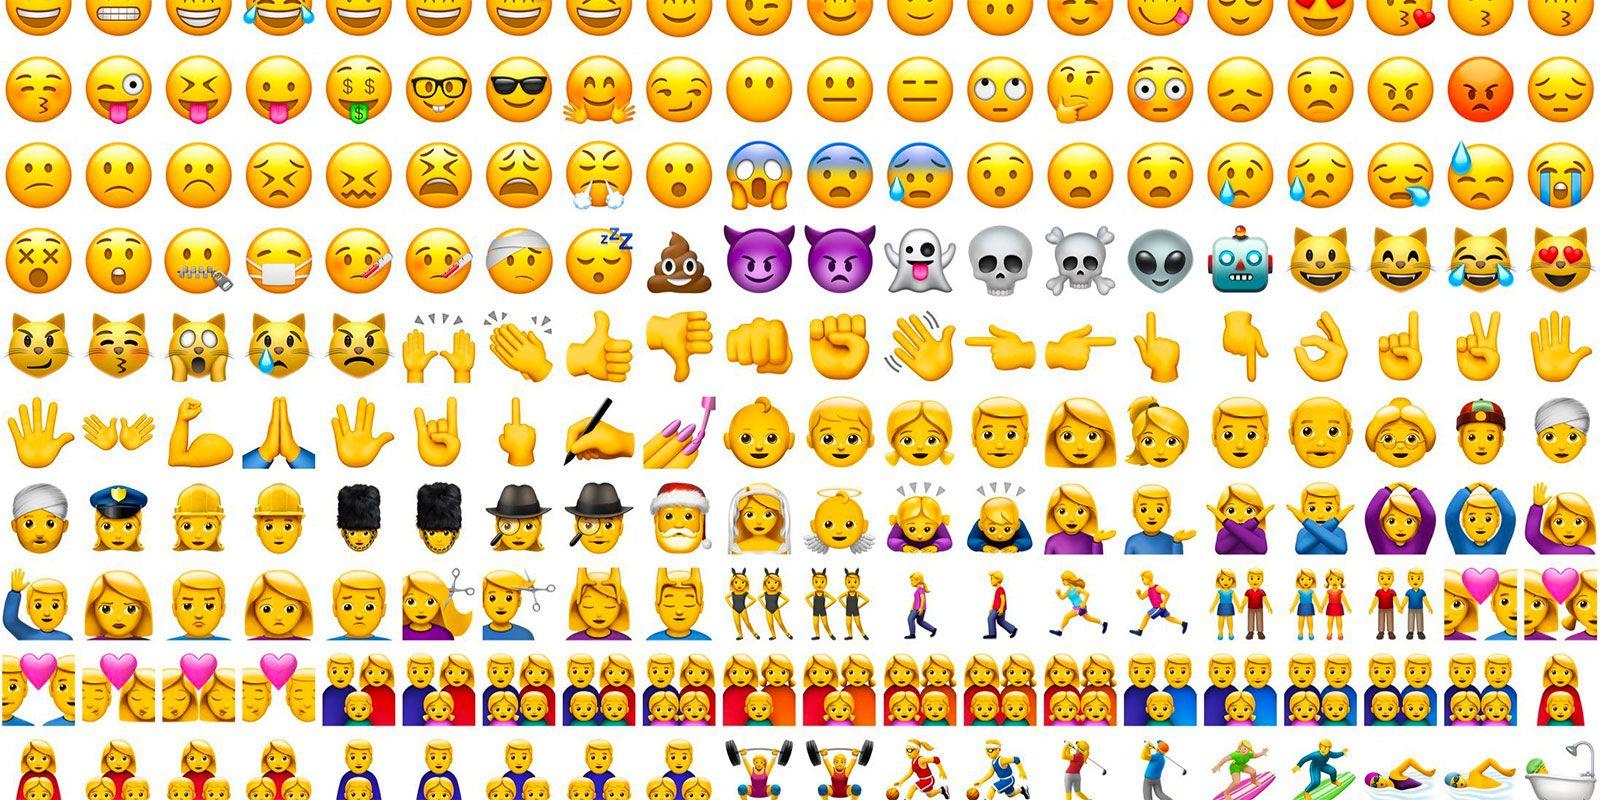 Iphone To Android Emojis So Relevant Ios Emoji Emoji Drawings Emoji